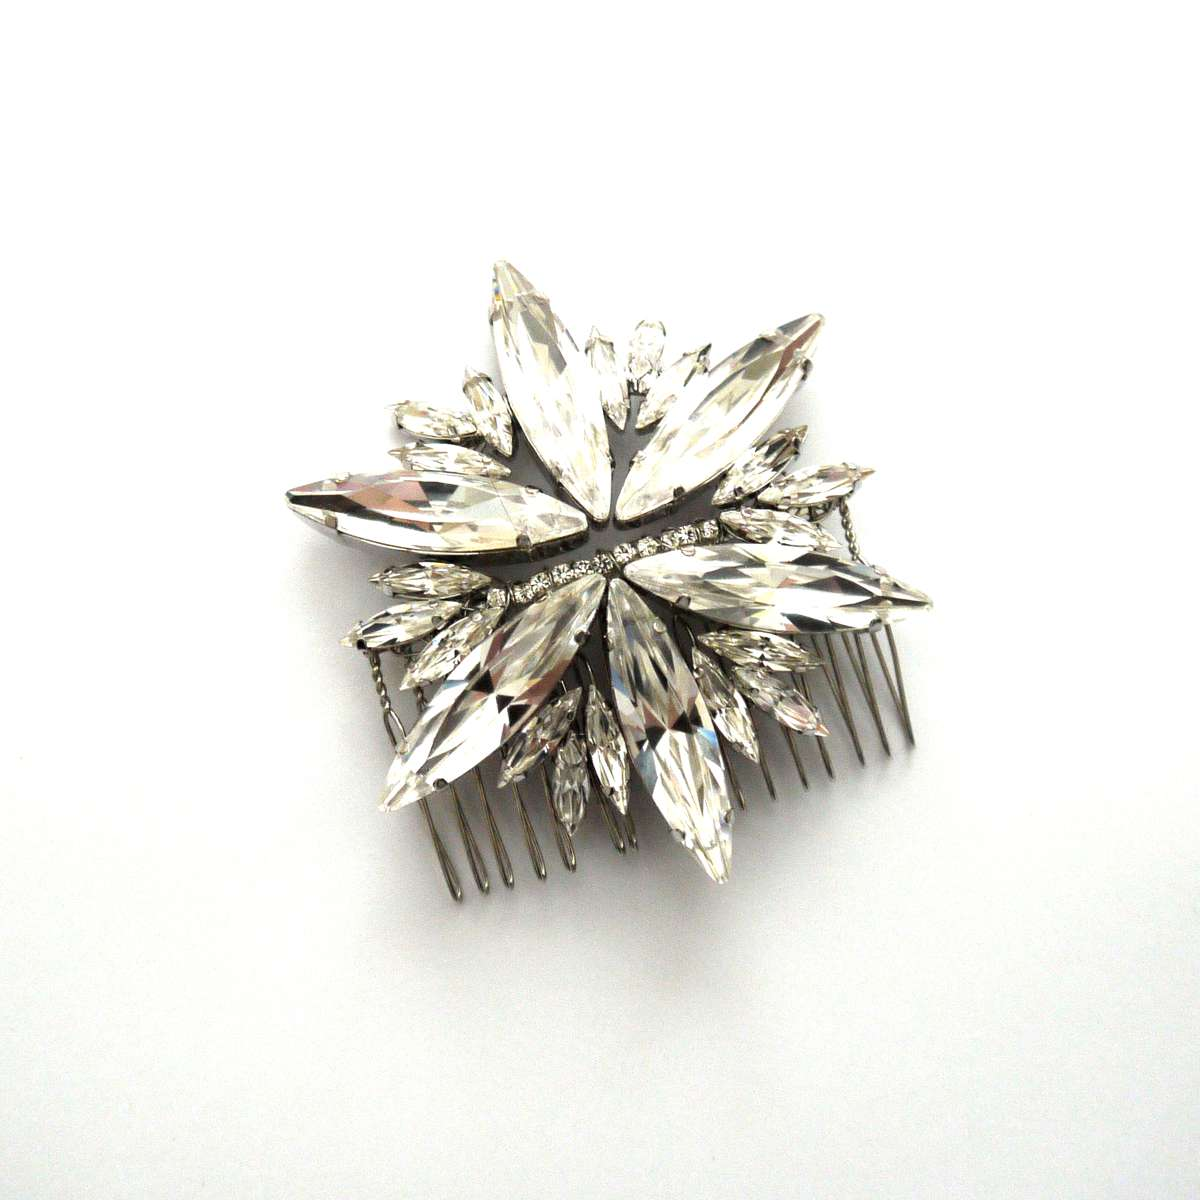 Starlight Comb Laurellime.com £225.00